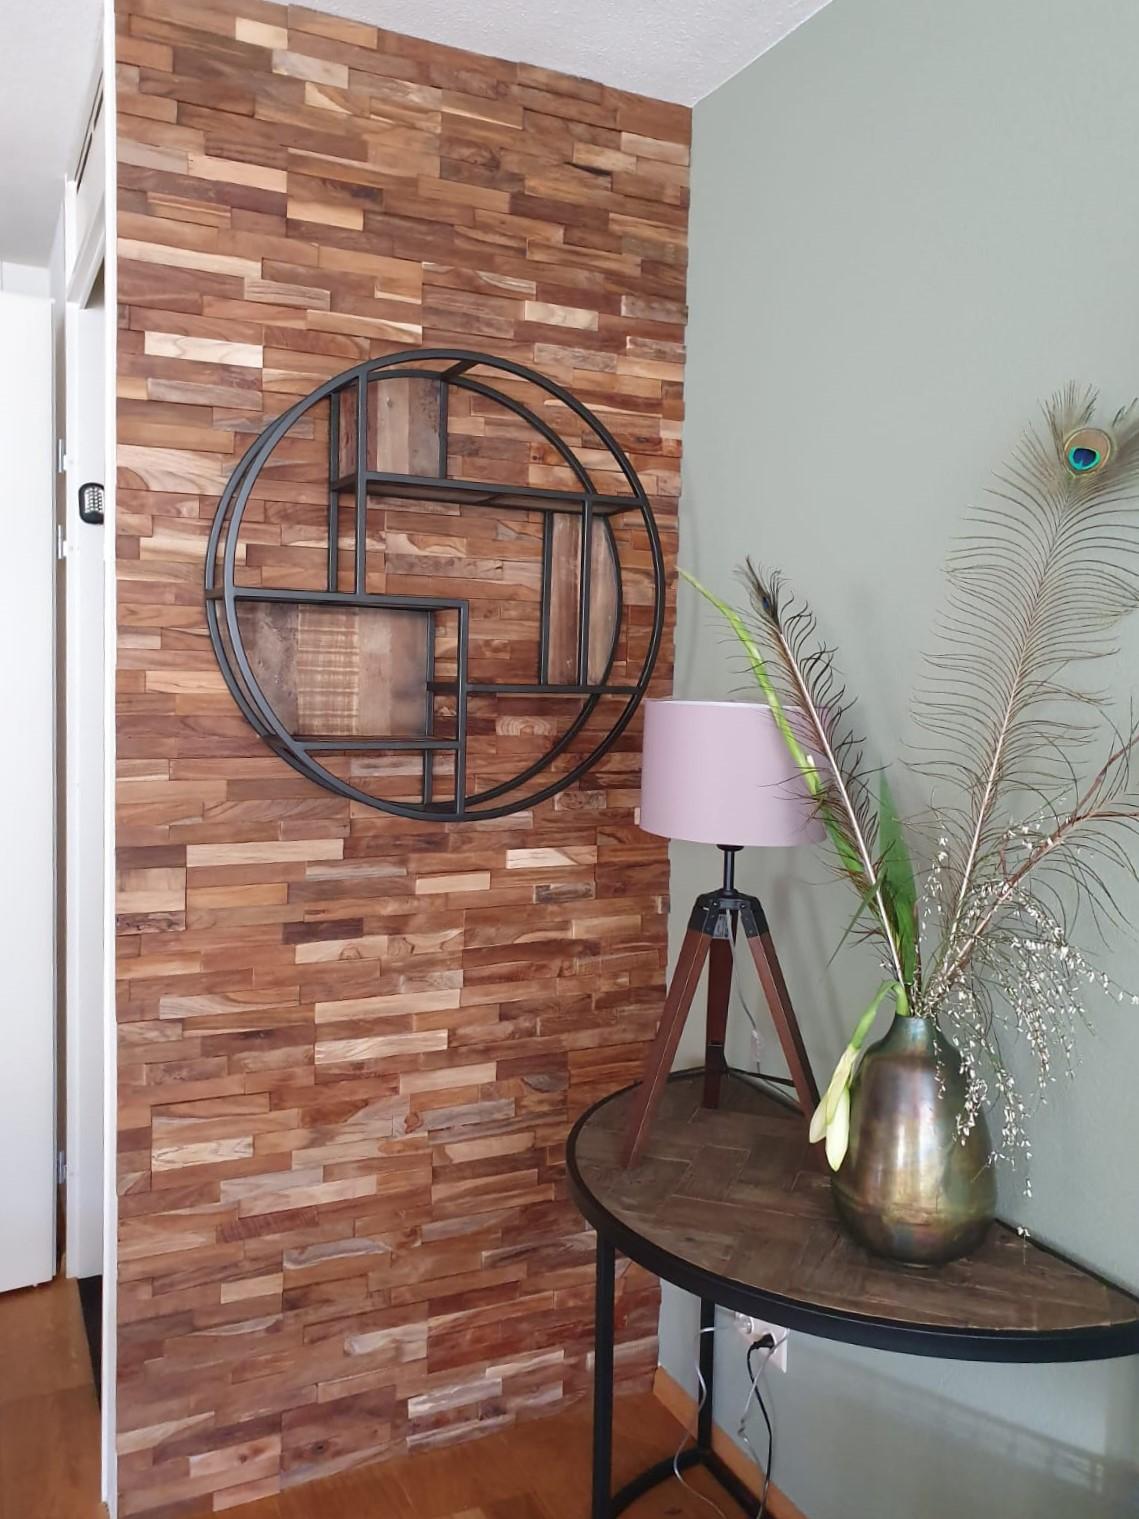 Houtrstrips Sense | Woodindustries